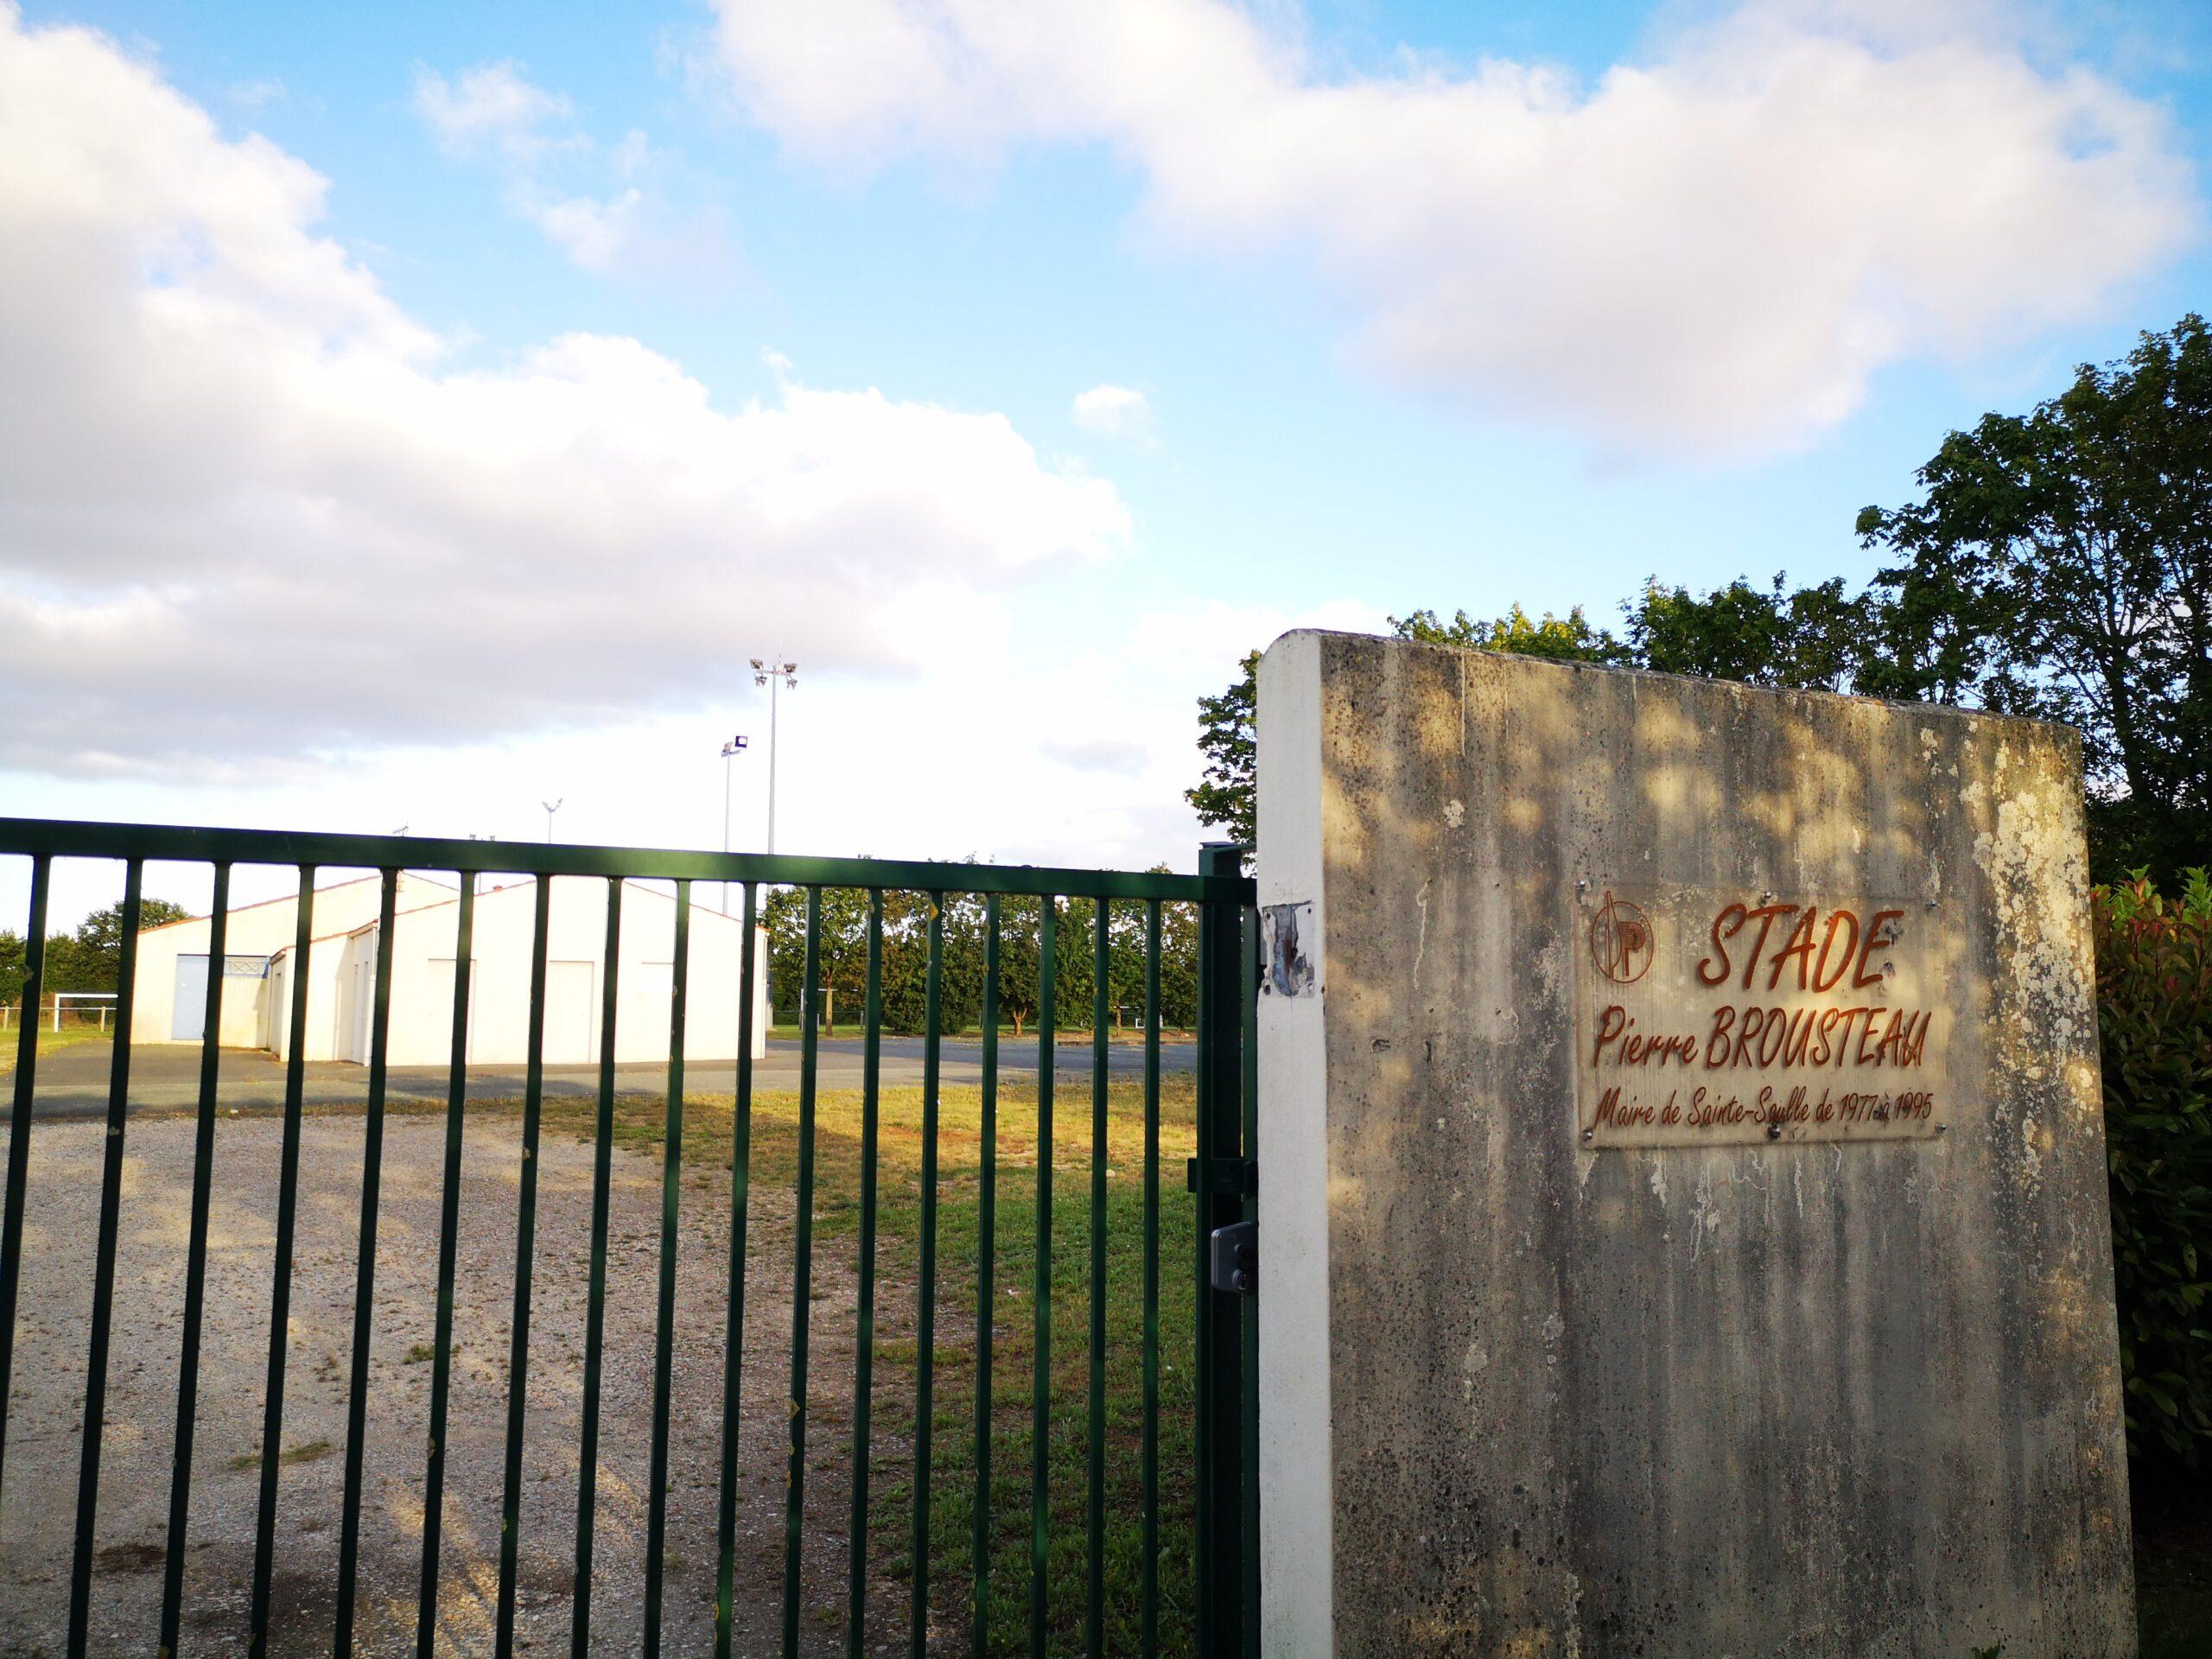 Stade Pierre Brousteau